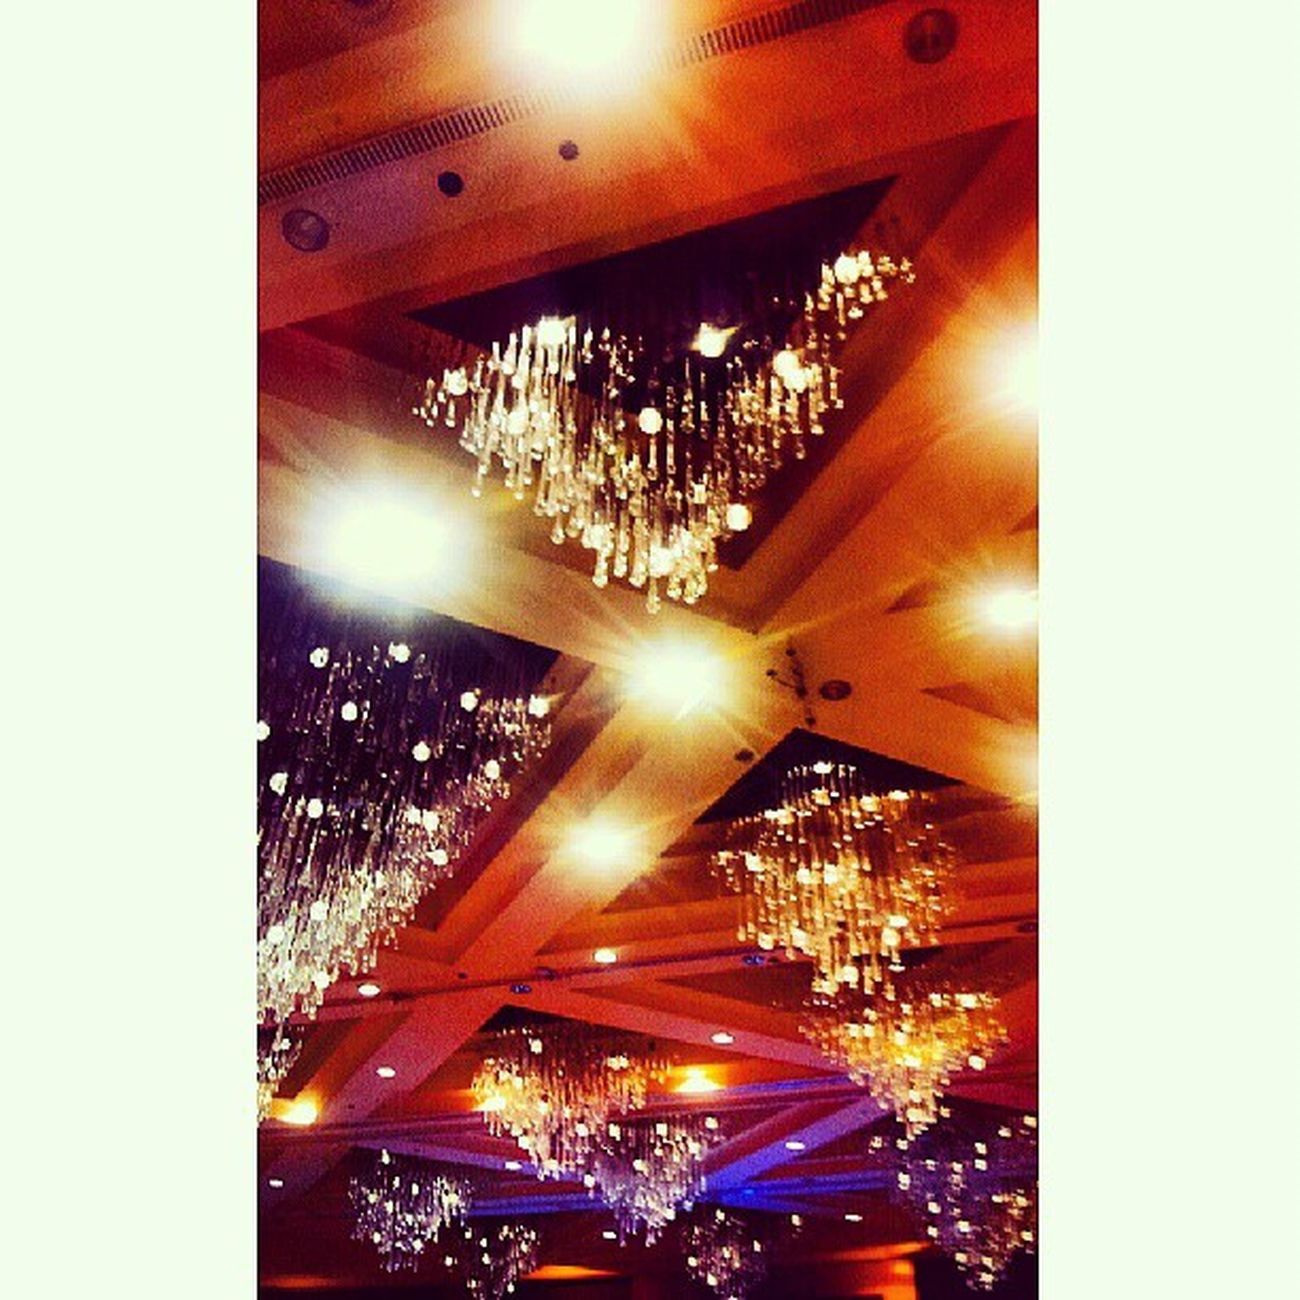 Chandelier Sofitelmanila Sofitel Luxuryhotel samsungphotography phonephotography s2photography